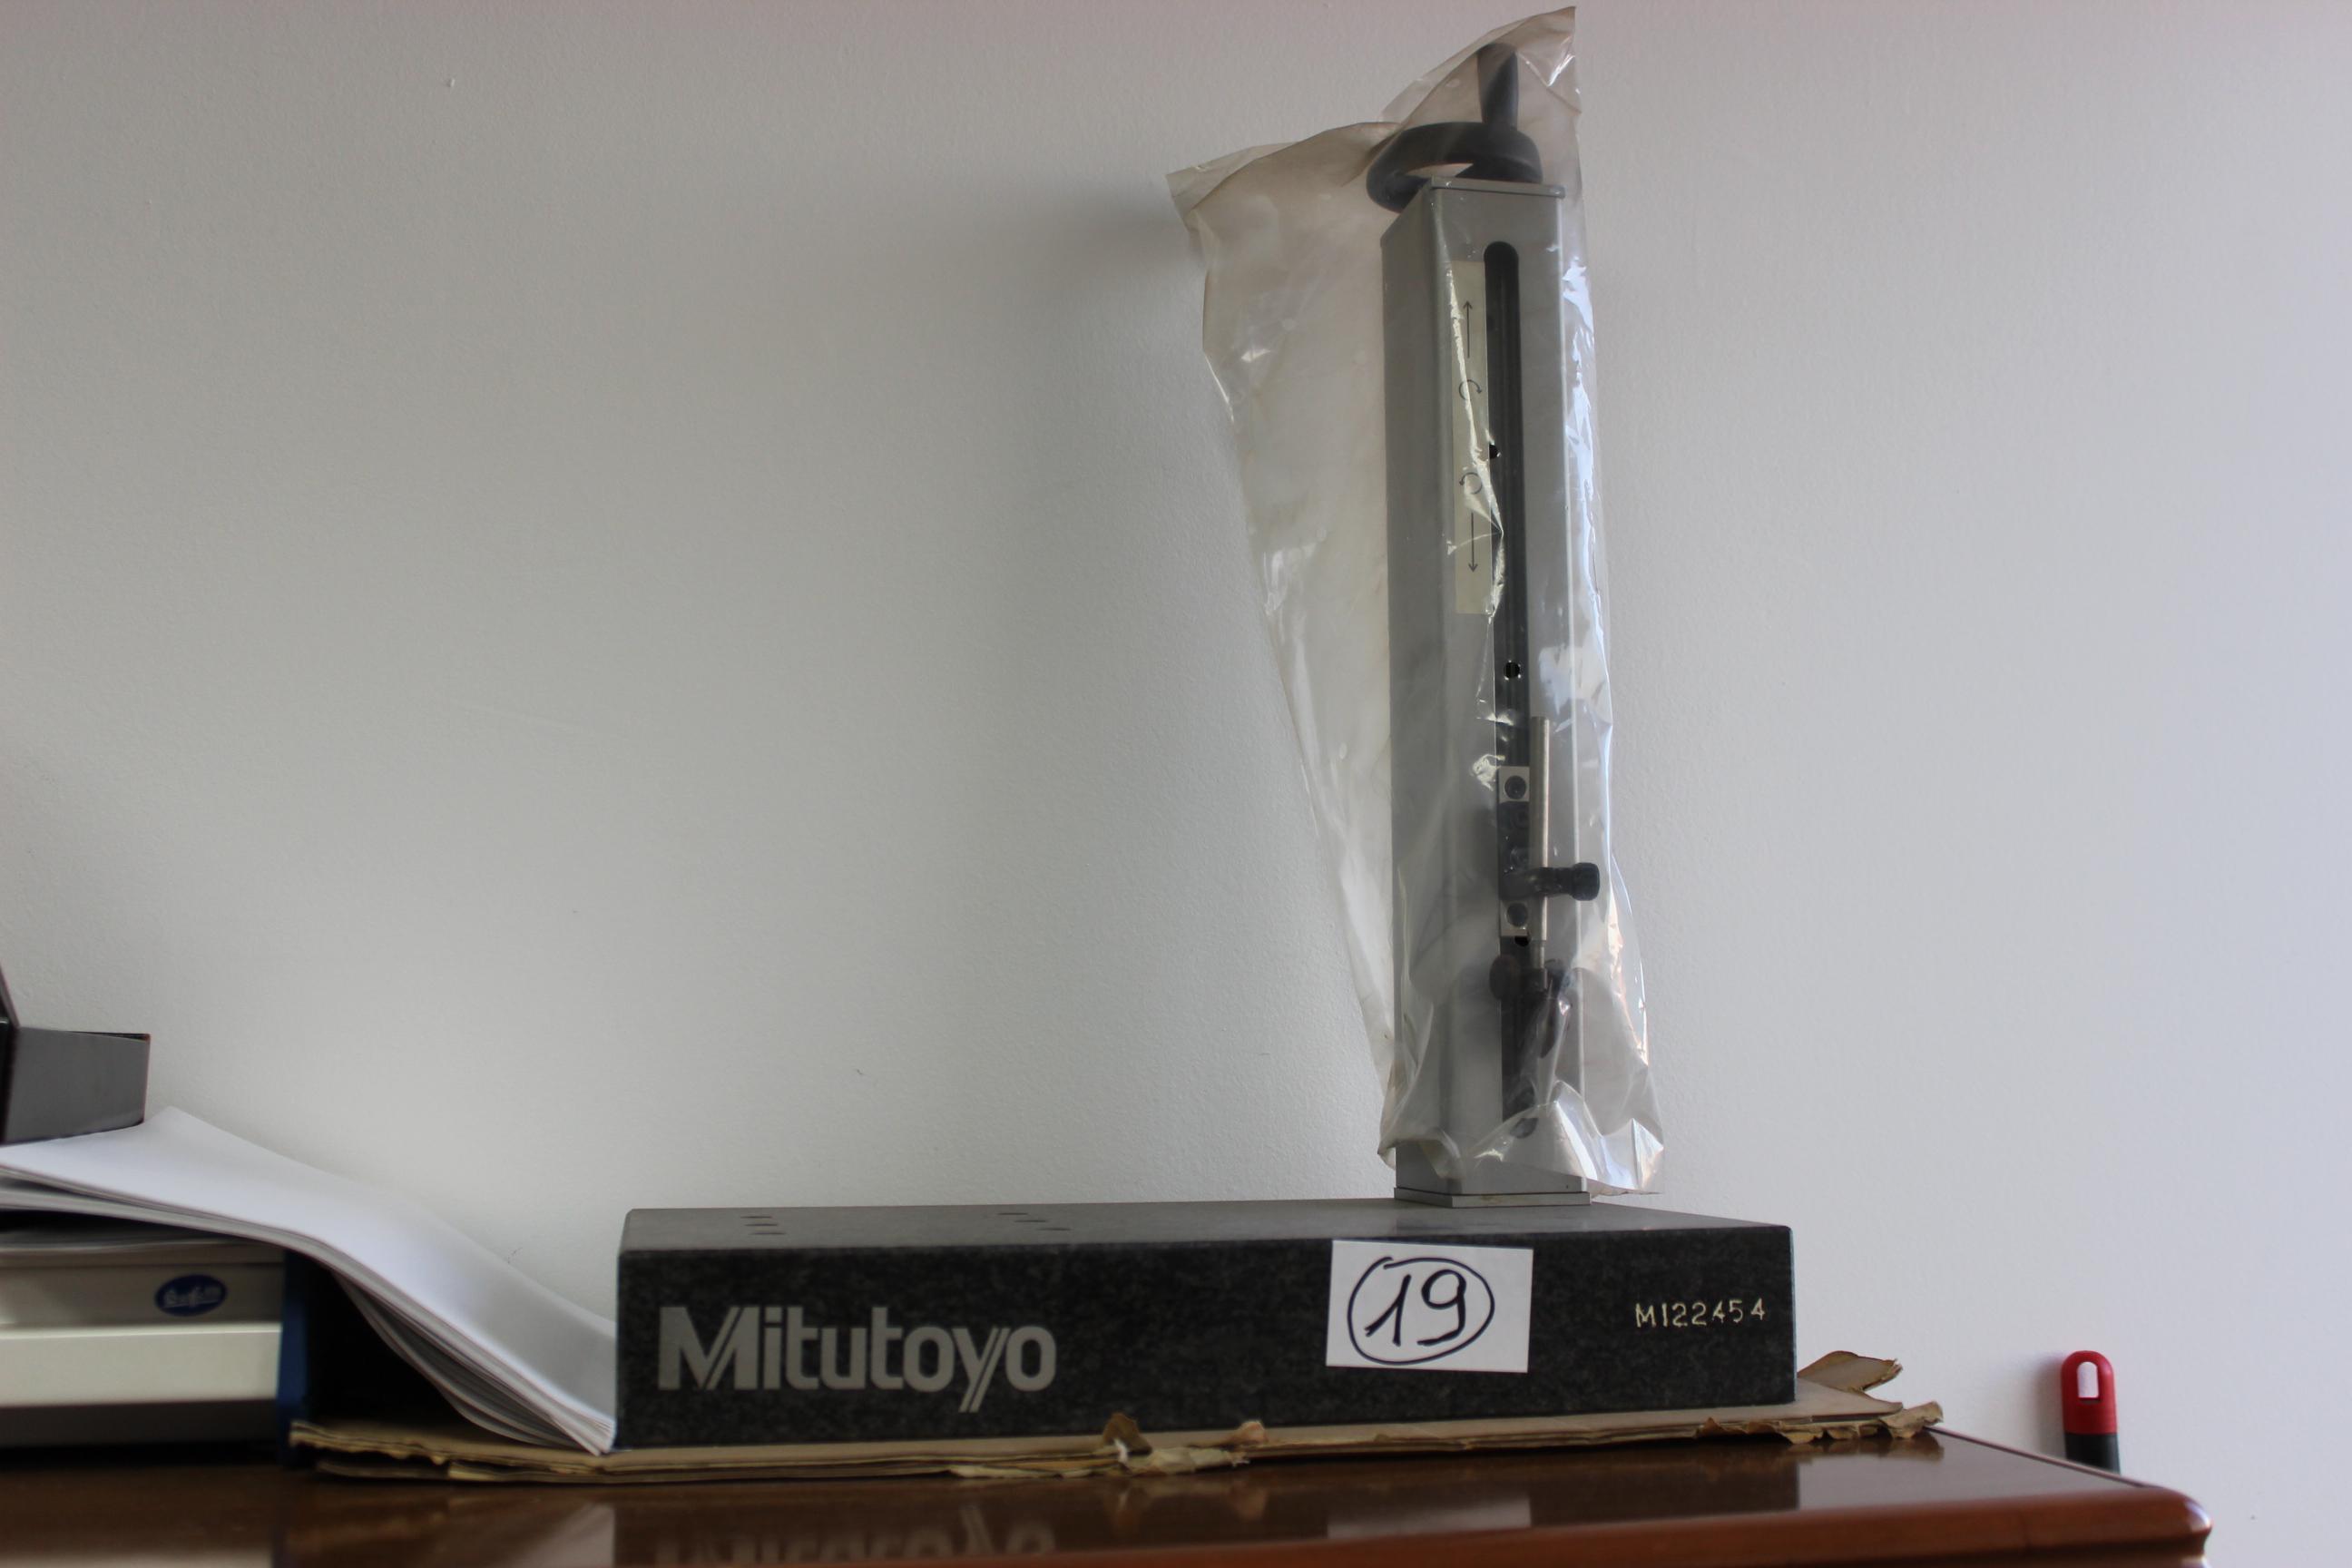 Rugosimetro Mitutoyo